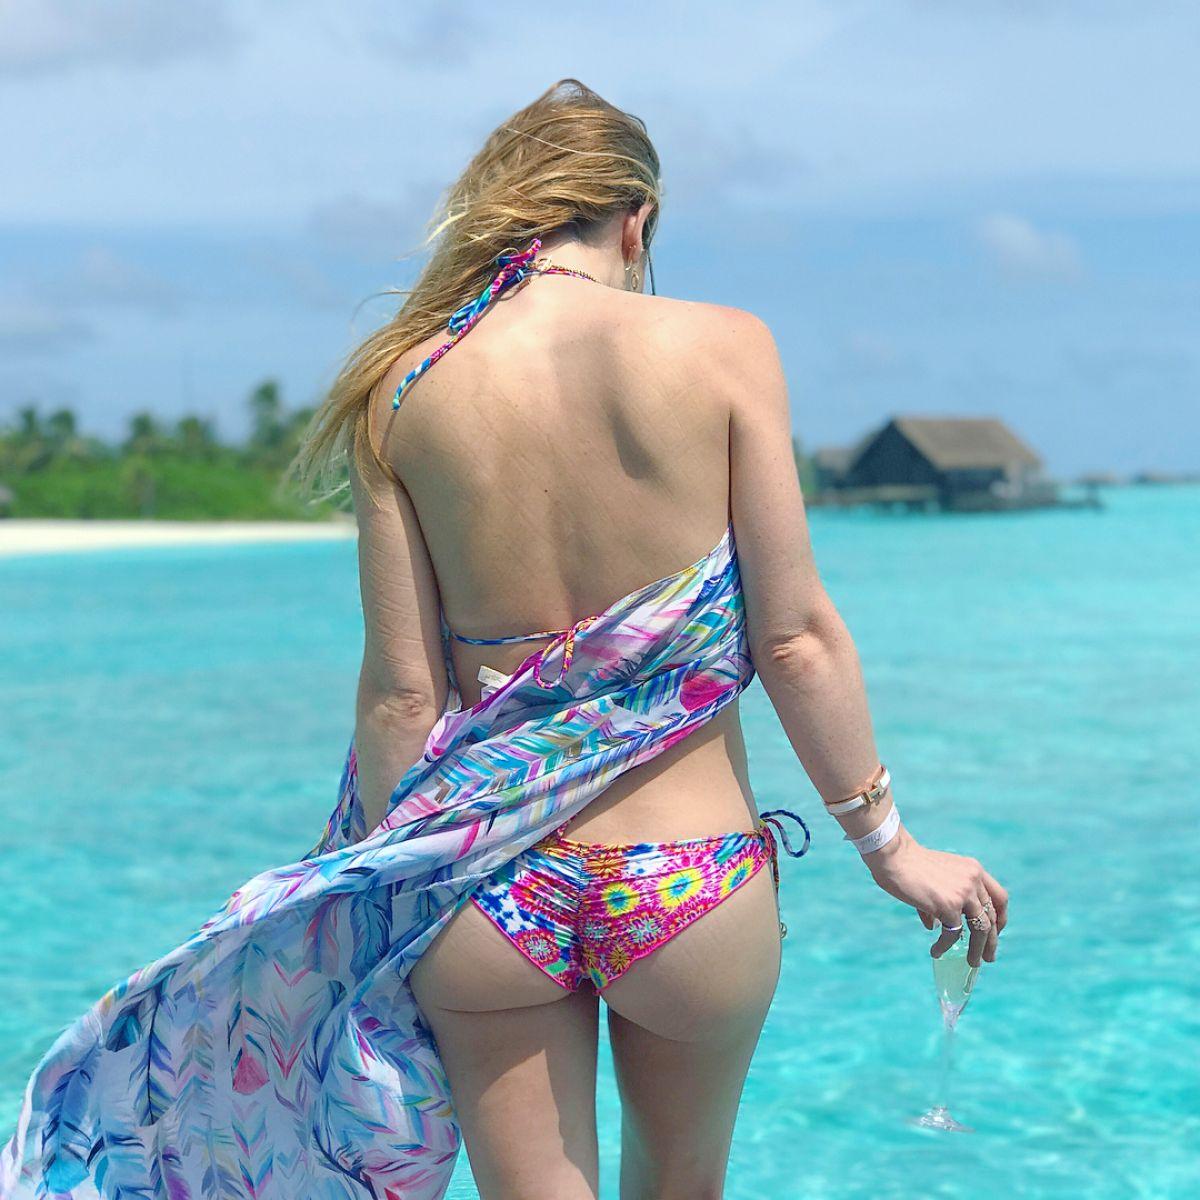 Bikini revisited